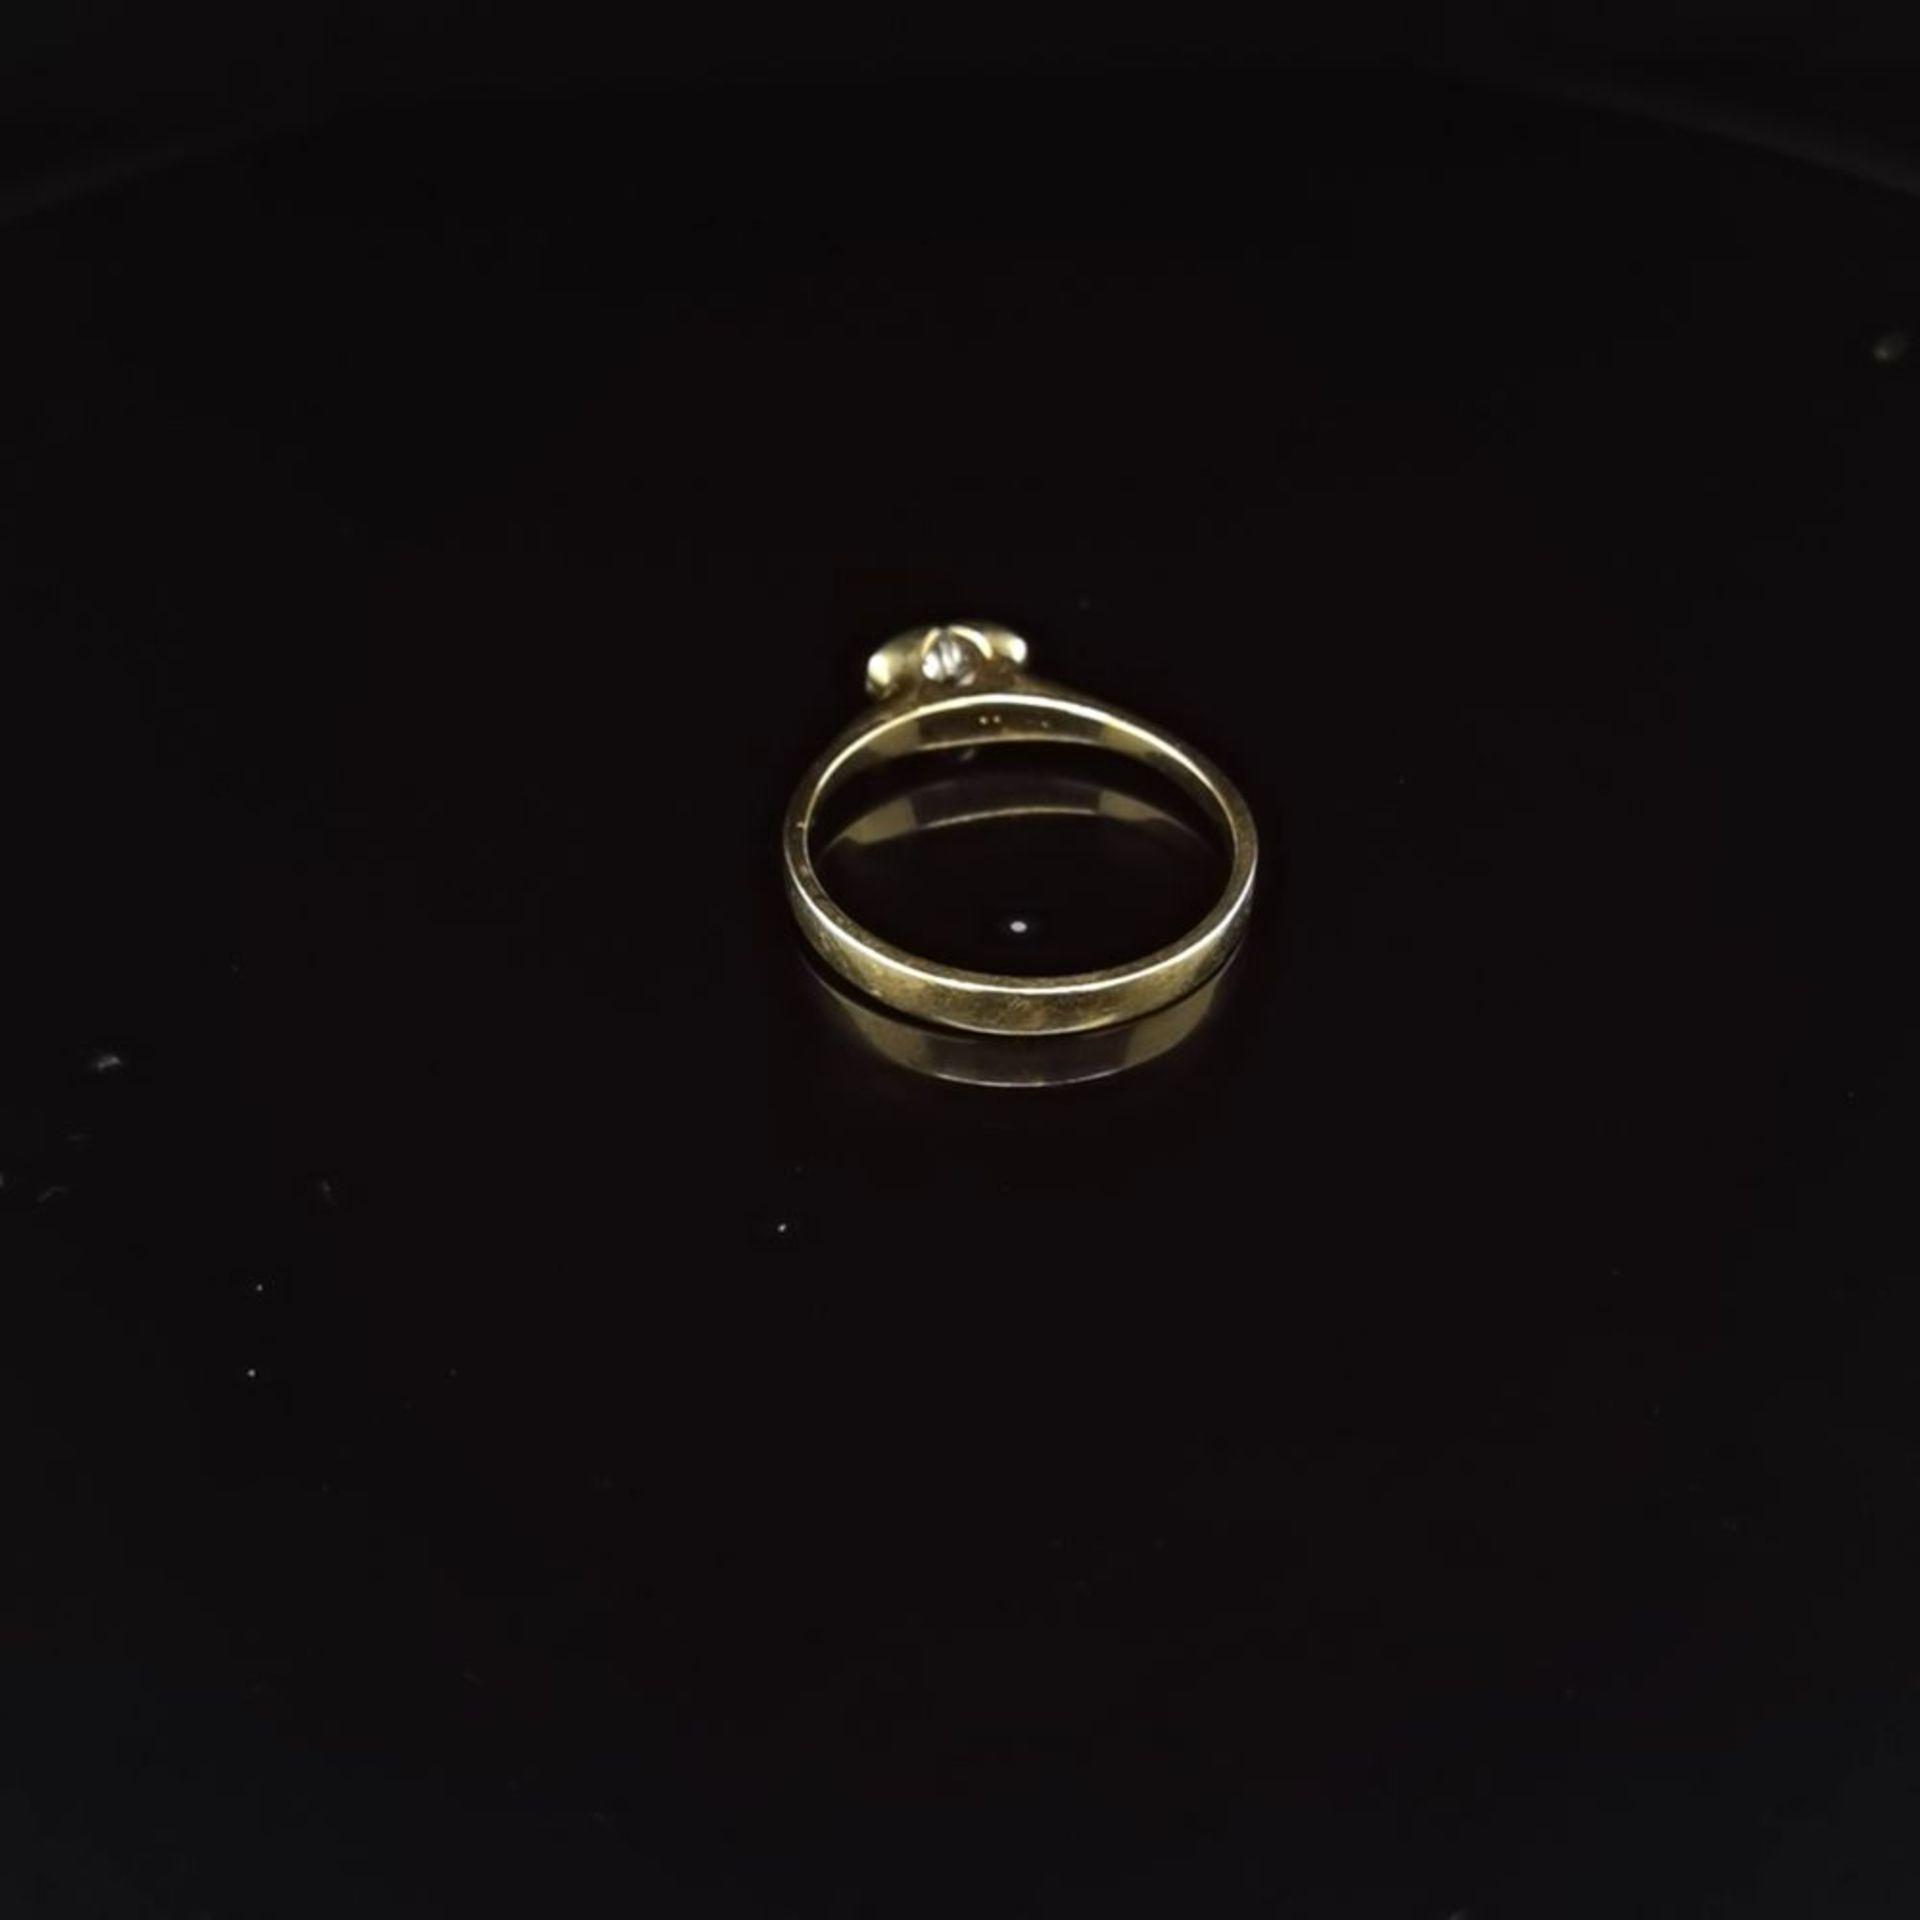 Brillant-Ring, 585 Gelbgold 2 - Image 3 of 3